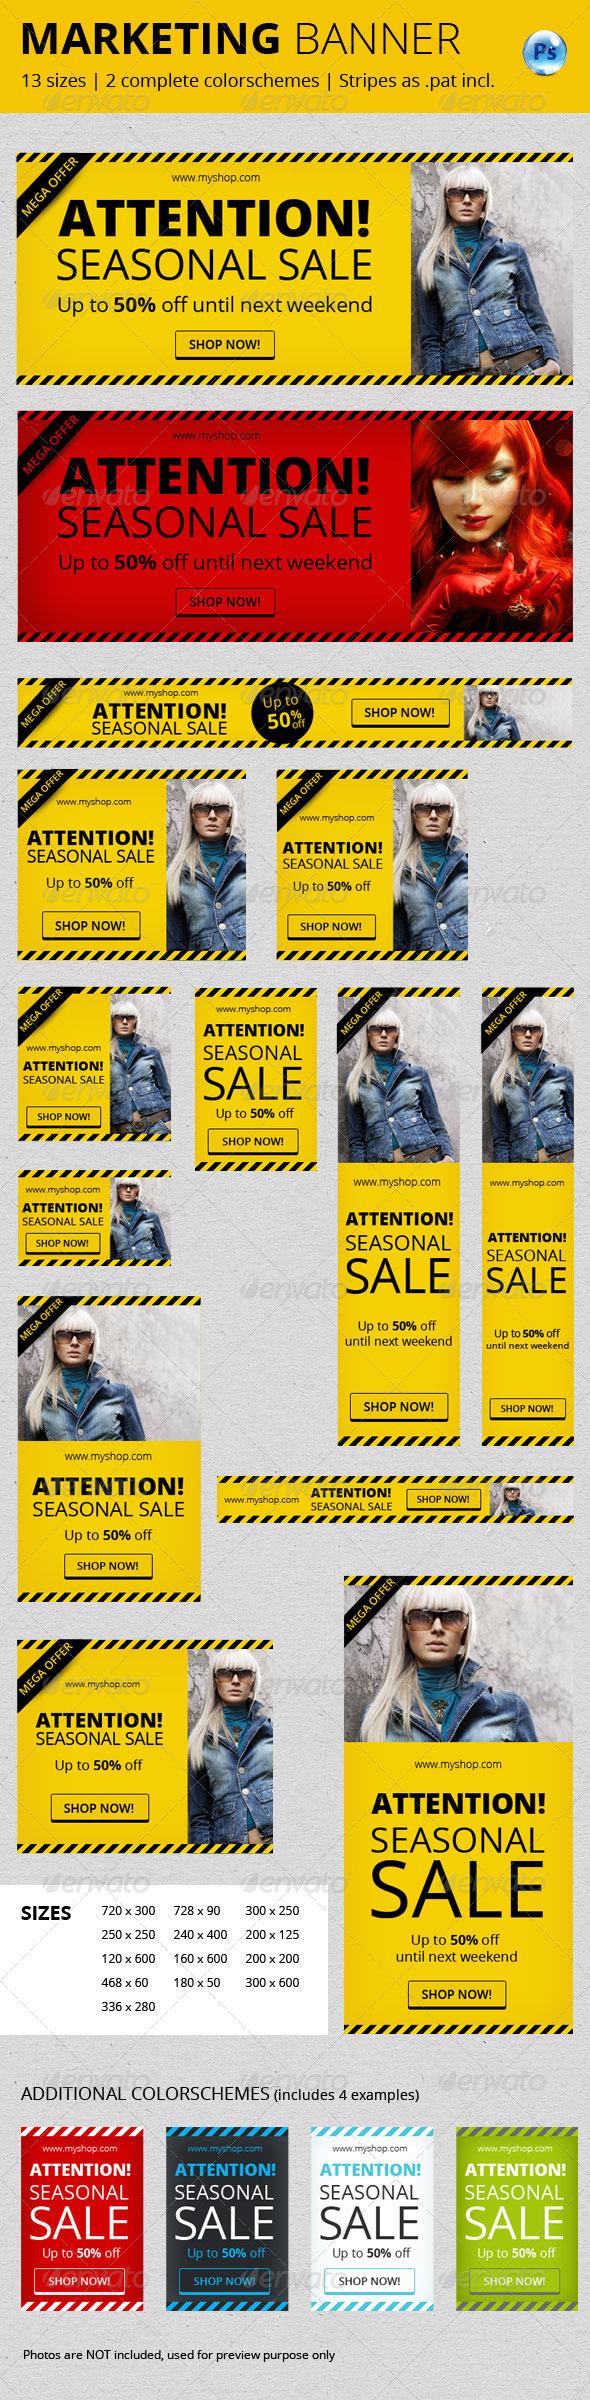 Marketing Banner Vol. II - Banners & Ads Web Elements